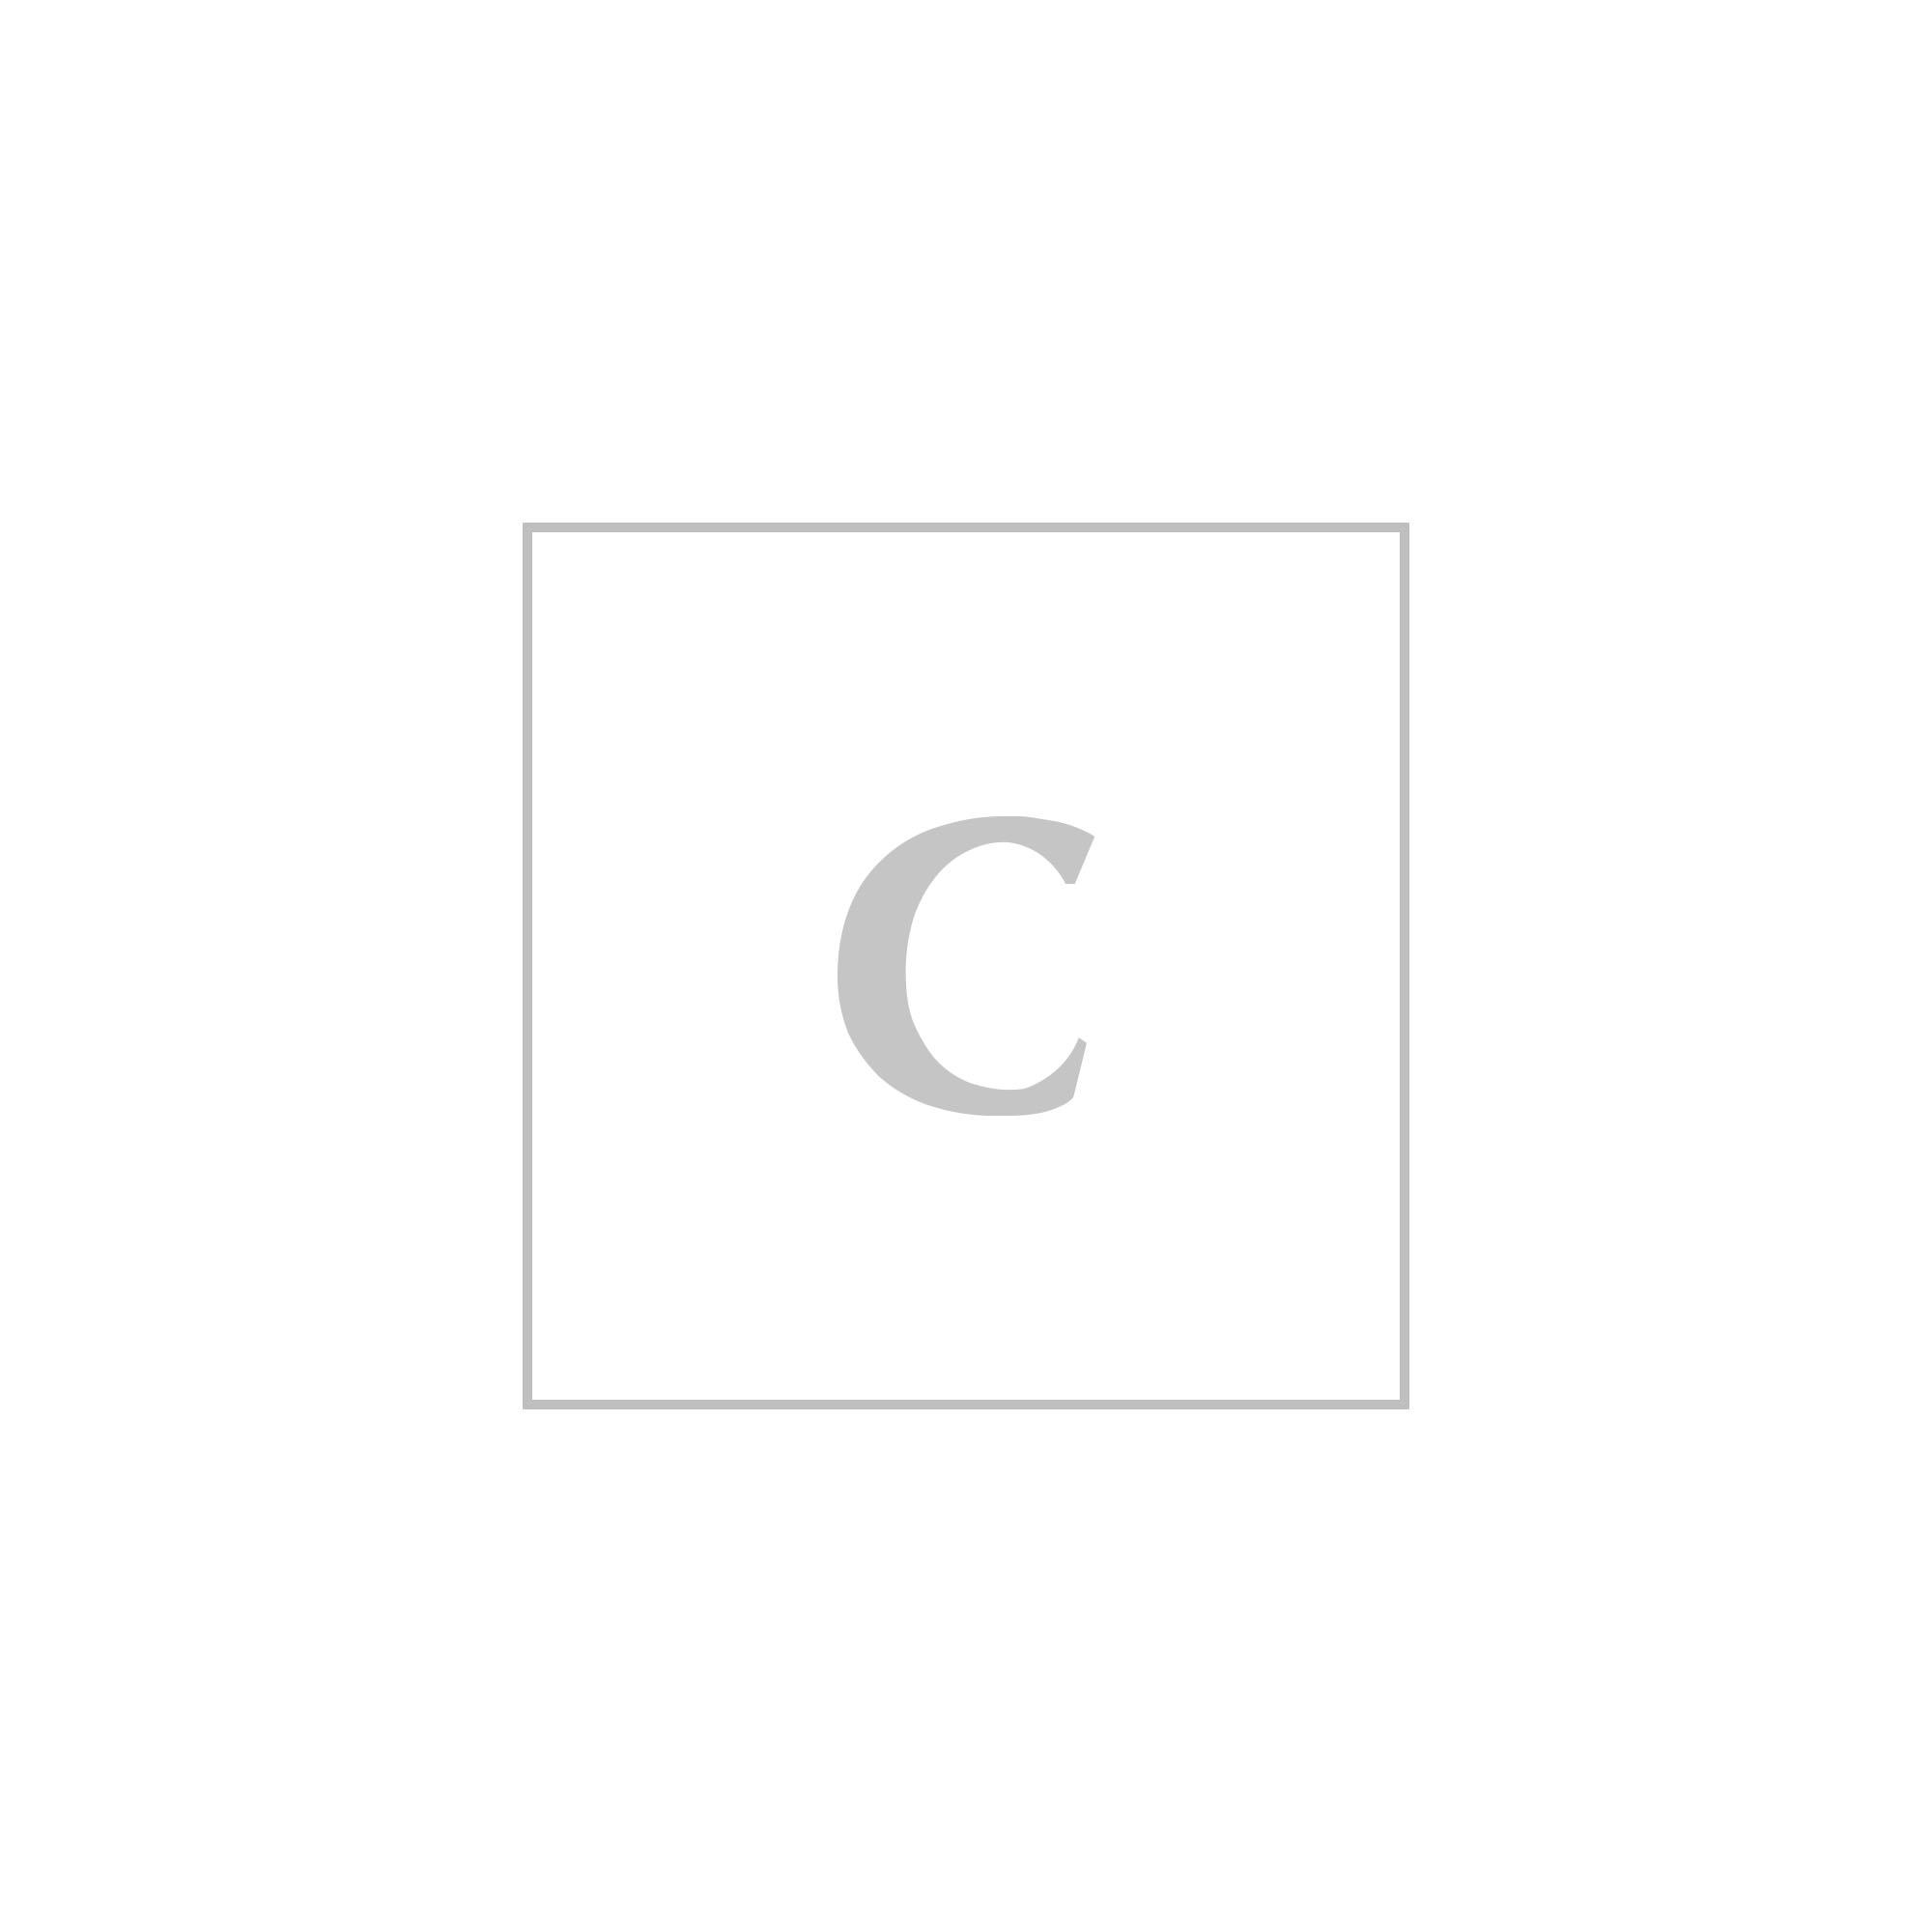 Piumini Basic Moncler Da Bianco Uomo Coltorti Boutique Rzwnx7U